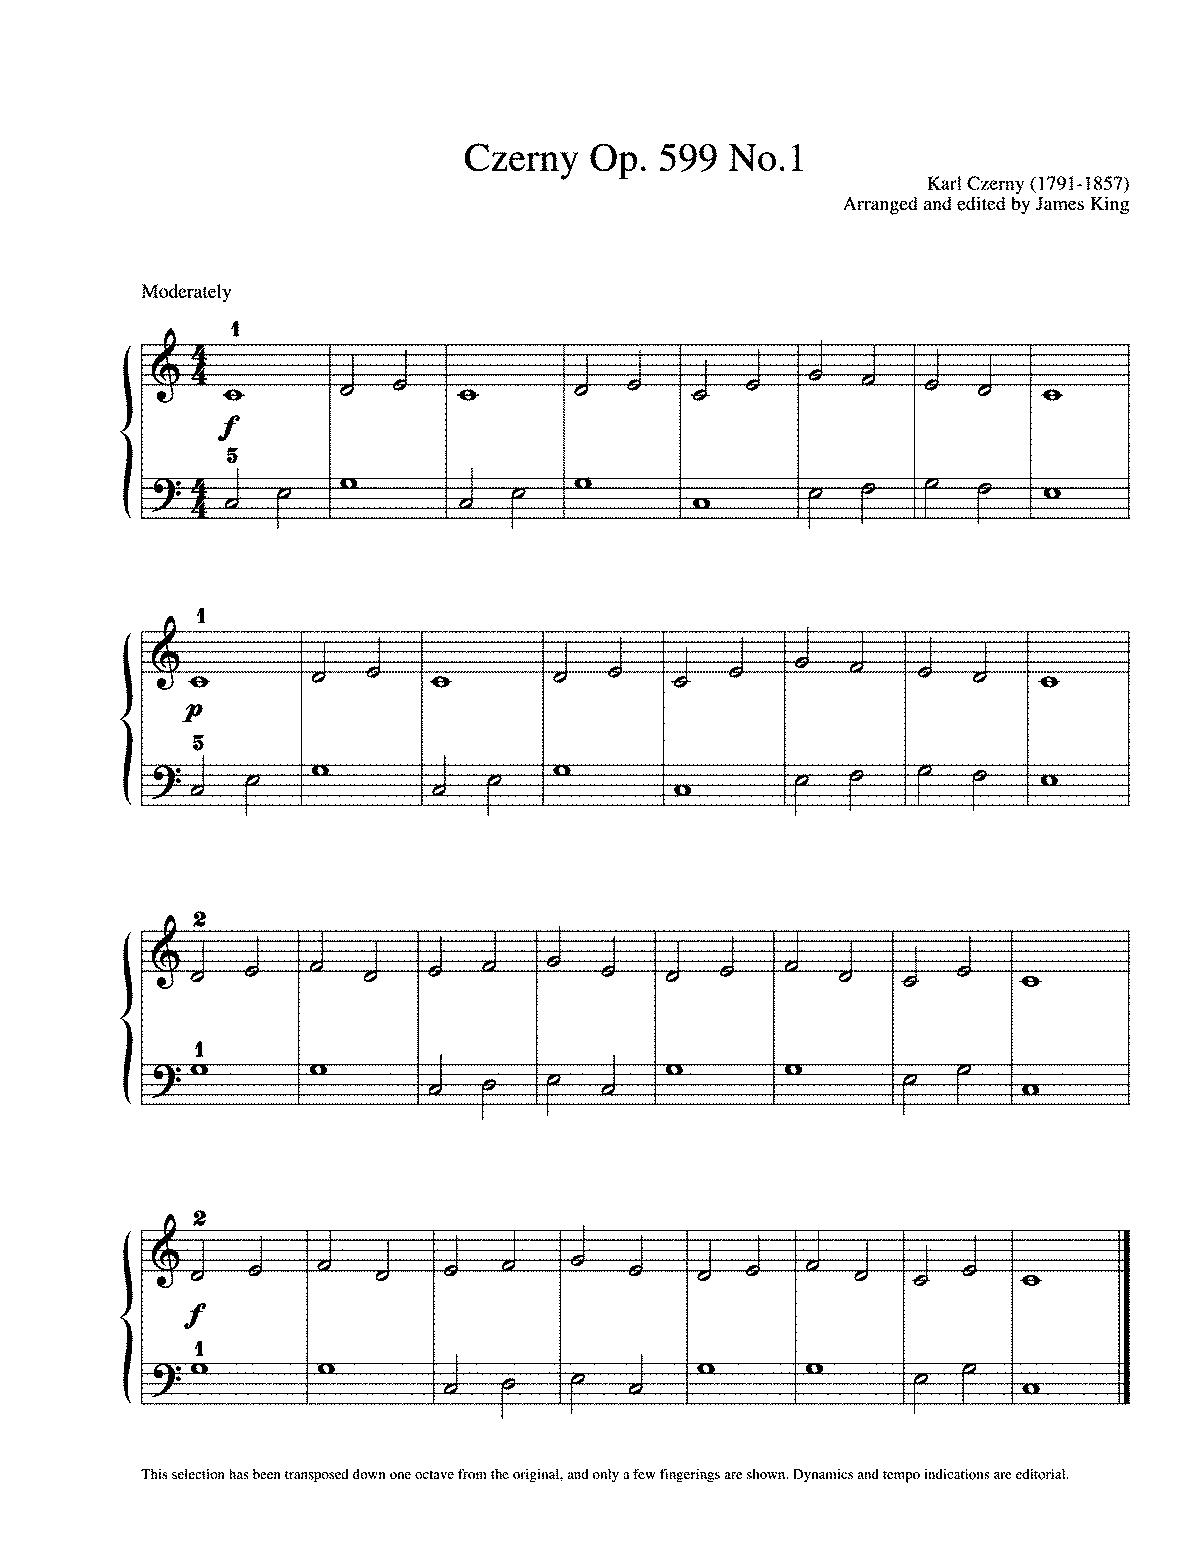 Workbooks violin note reading worksheets : Practical Exercises for Beginners, Op.599 (Czerny, Carl) - IMSLP ...